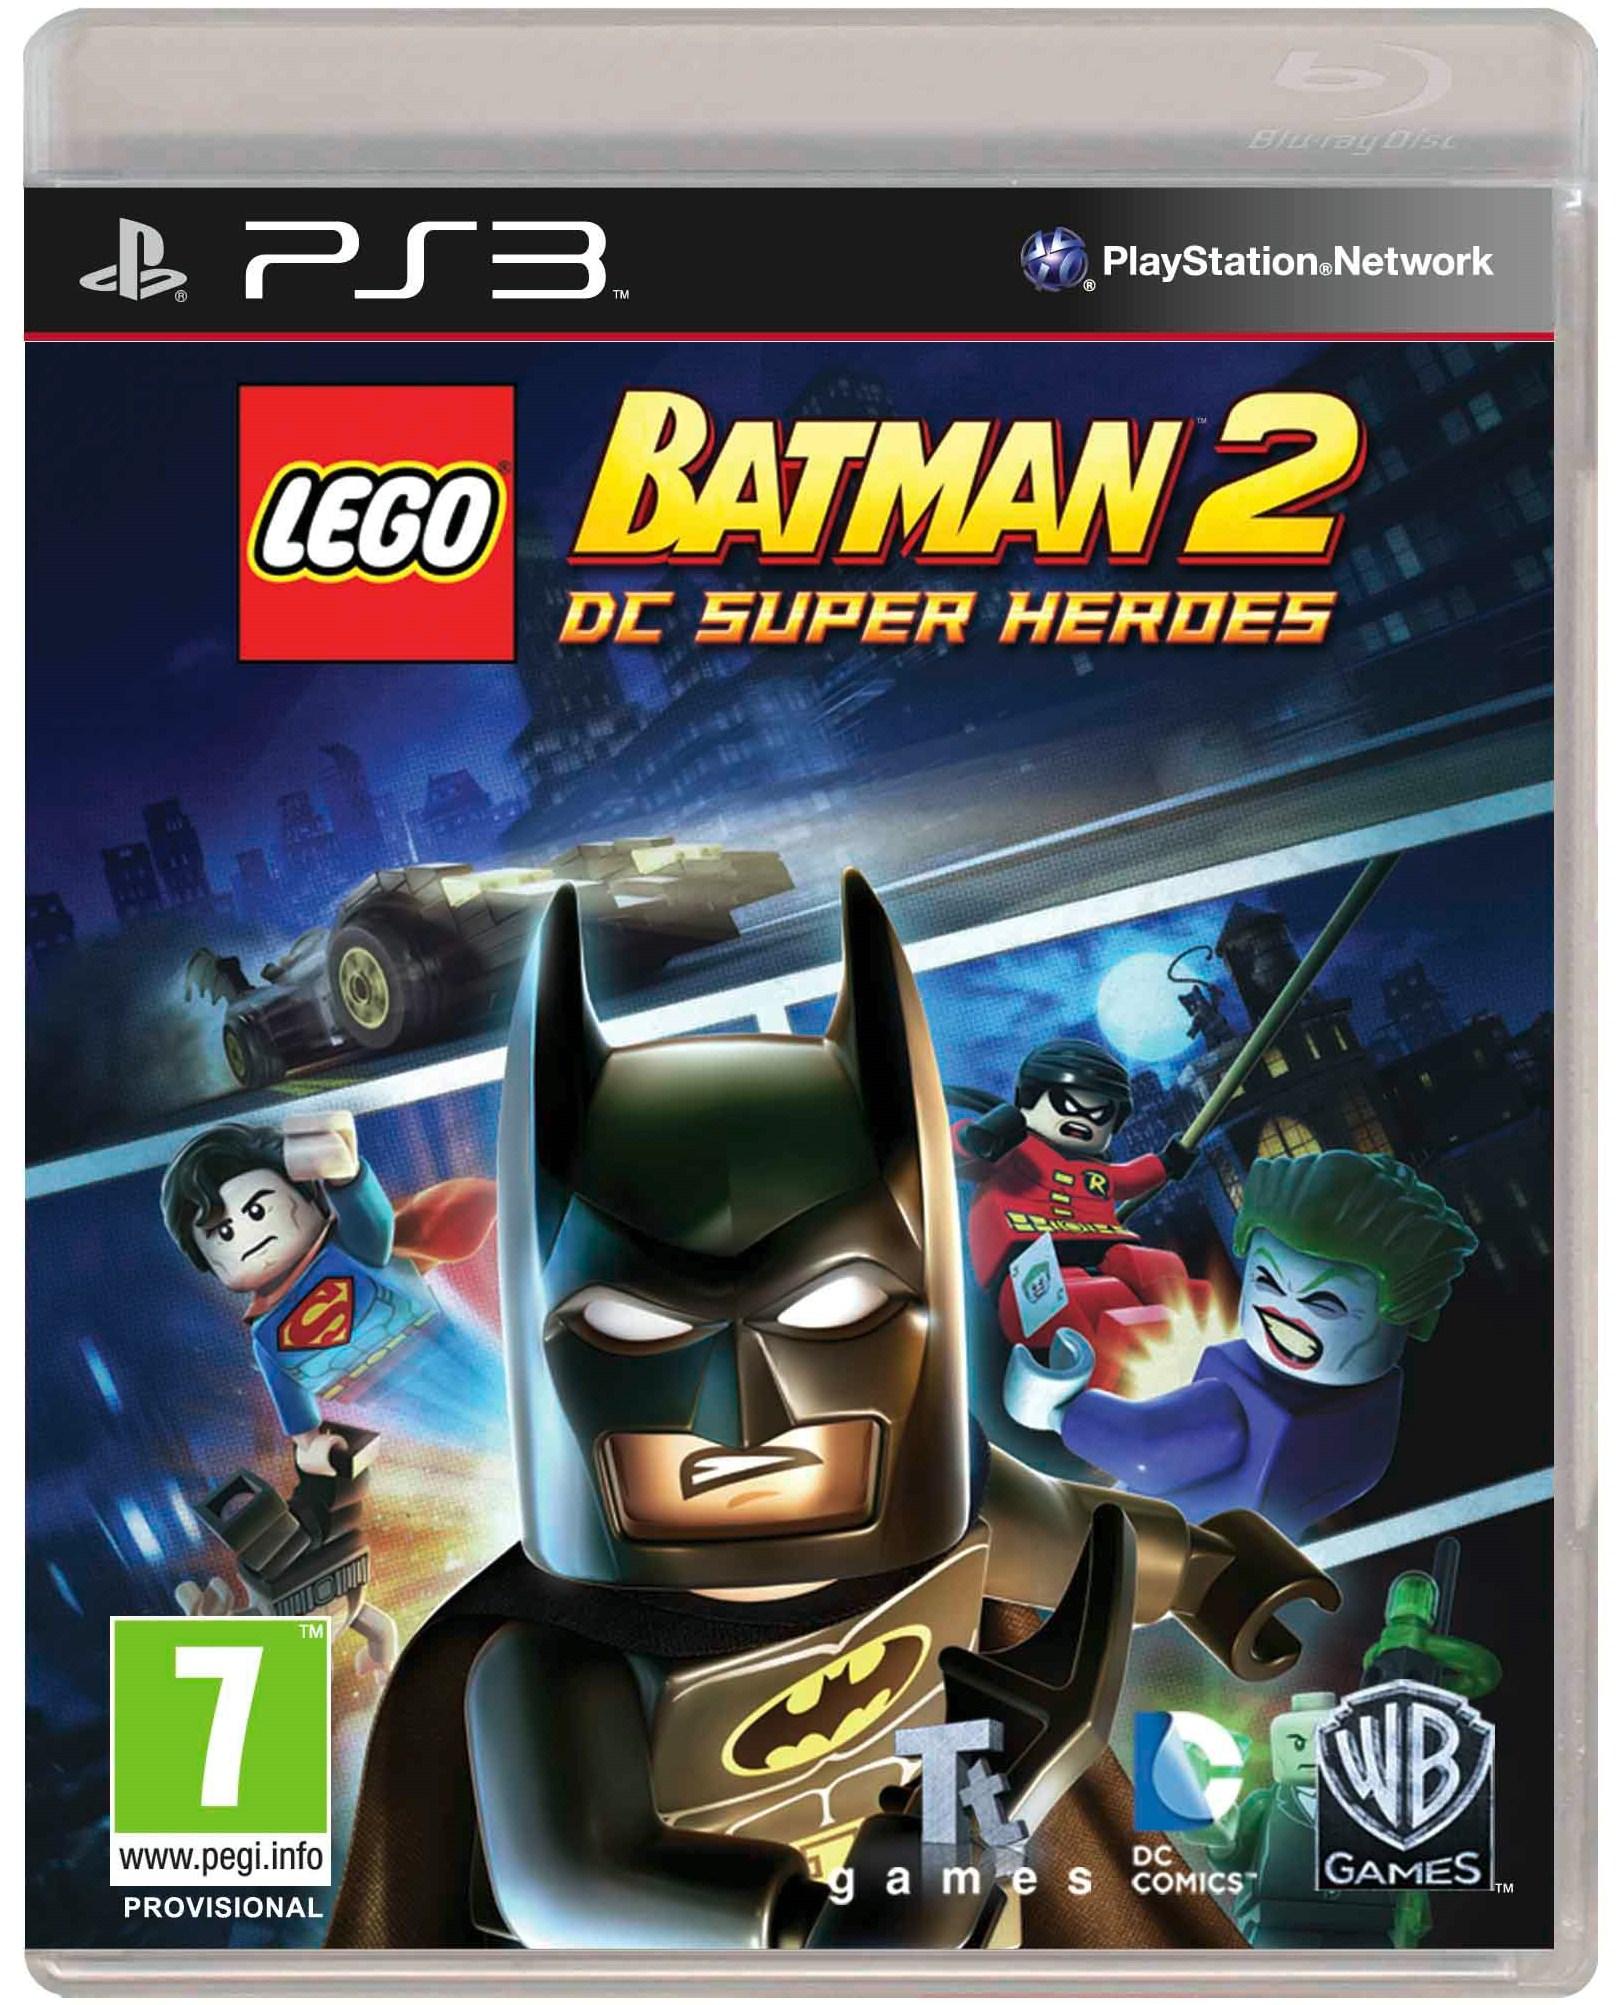 Lego Batman 2: DC Superheroes Featuring The Flash